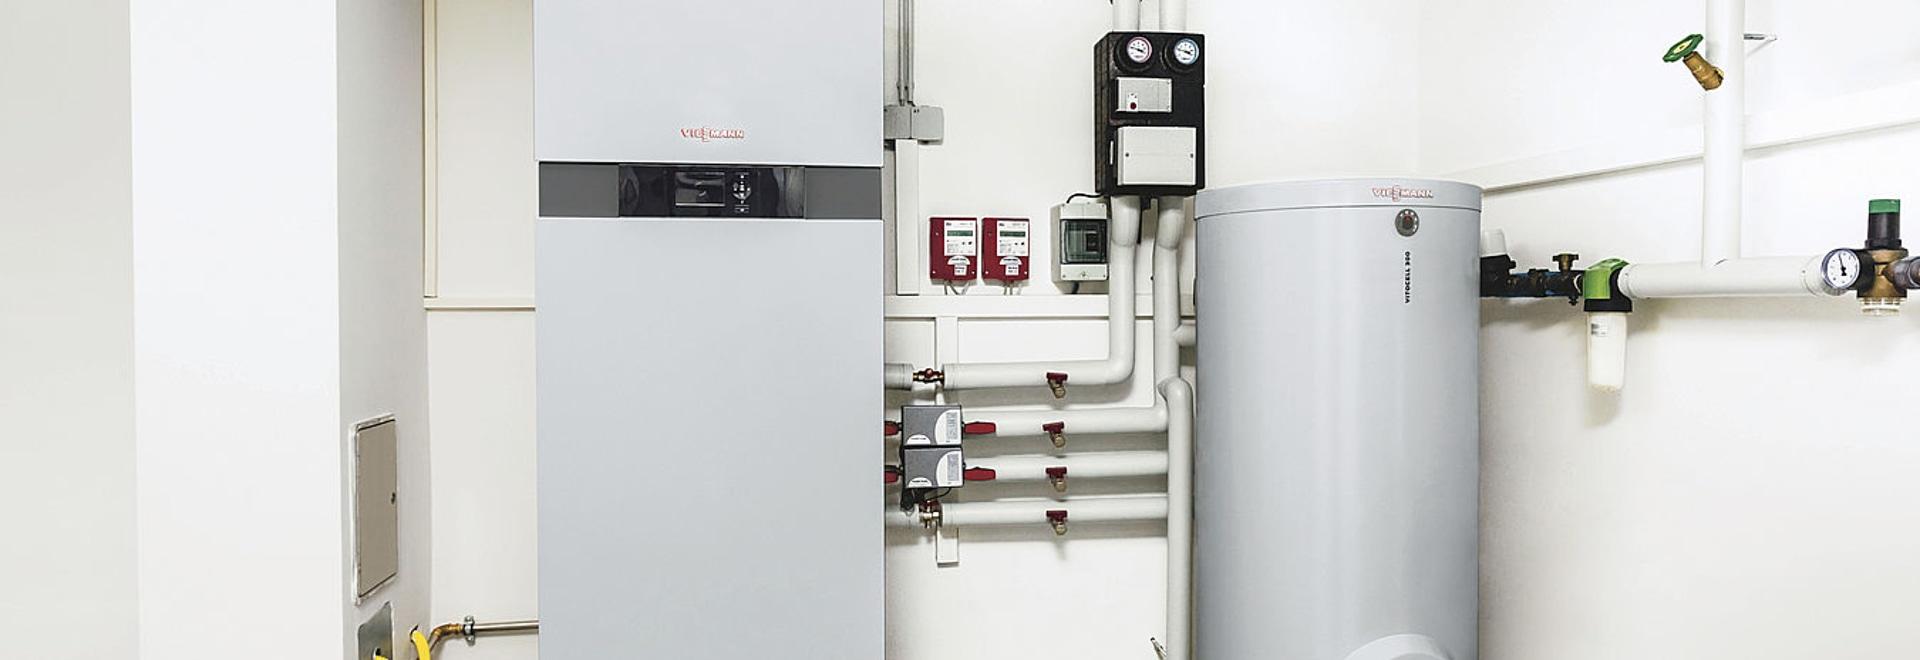 VITOSORP 200-F Gas-Adsorptionswärmepumpe